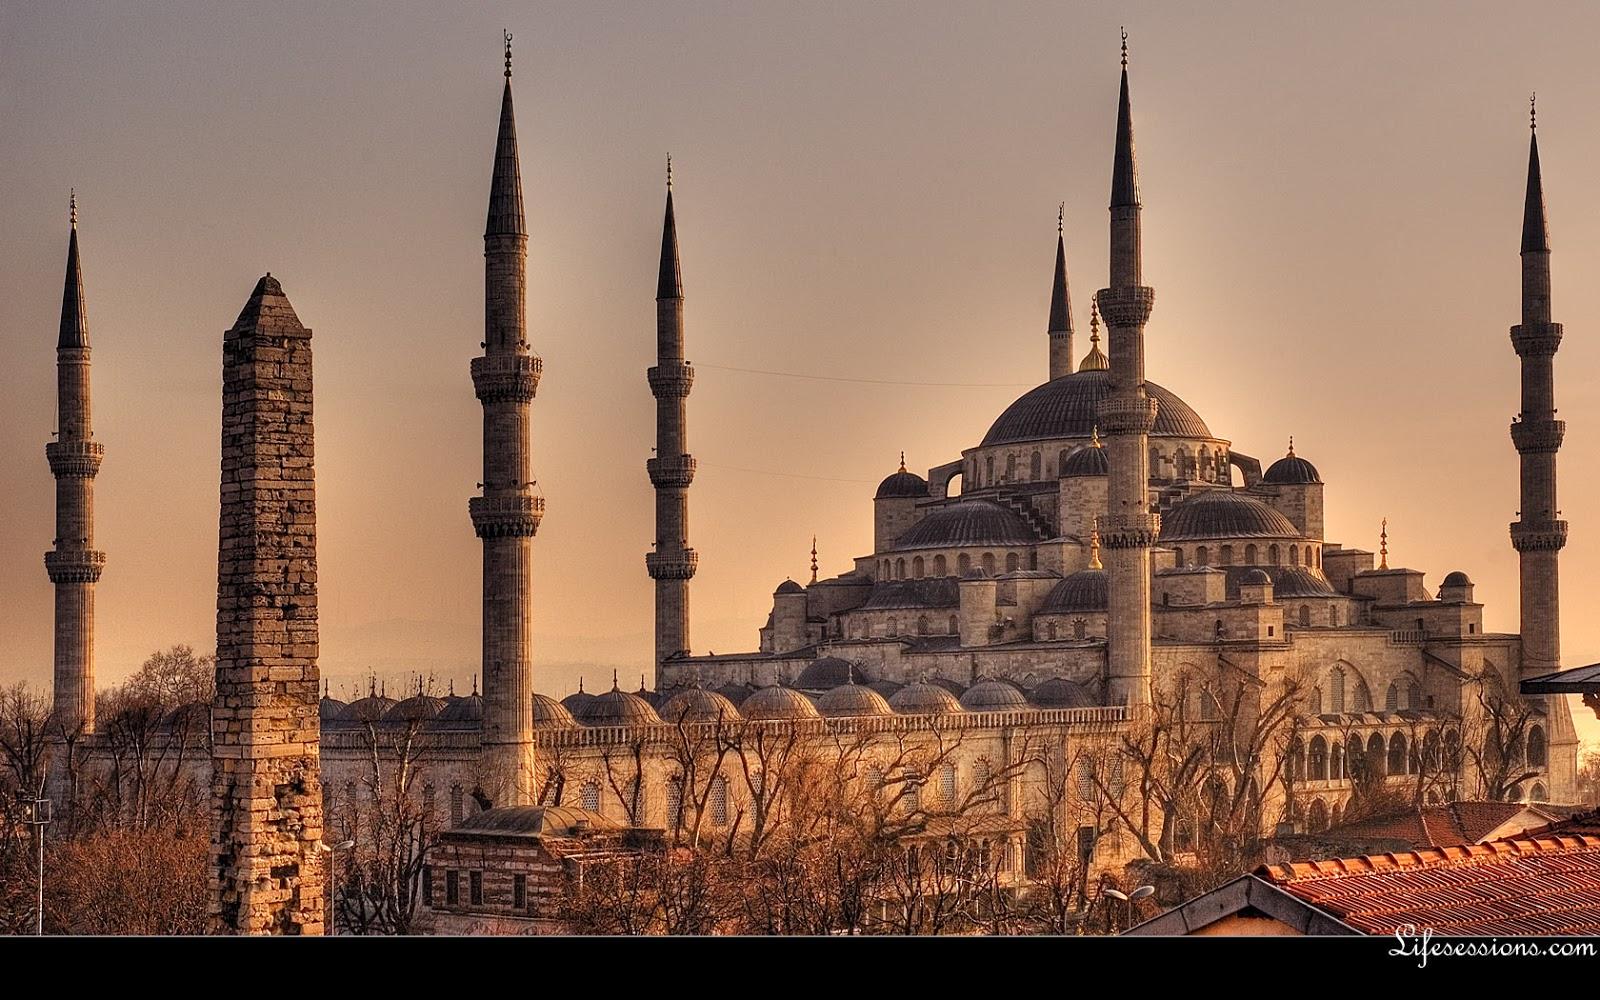 http://2.bp.blogspot.com/-IlCL2JVqQCs/UV6fhYlT86I/AAAAAAAACm4/uNr3MUiWE8w/s1600/istanbul_blue_mosque.jpg